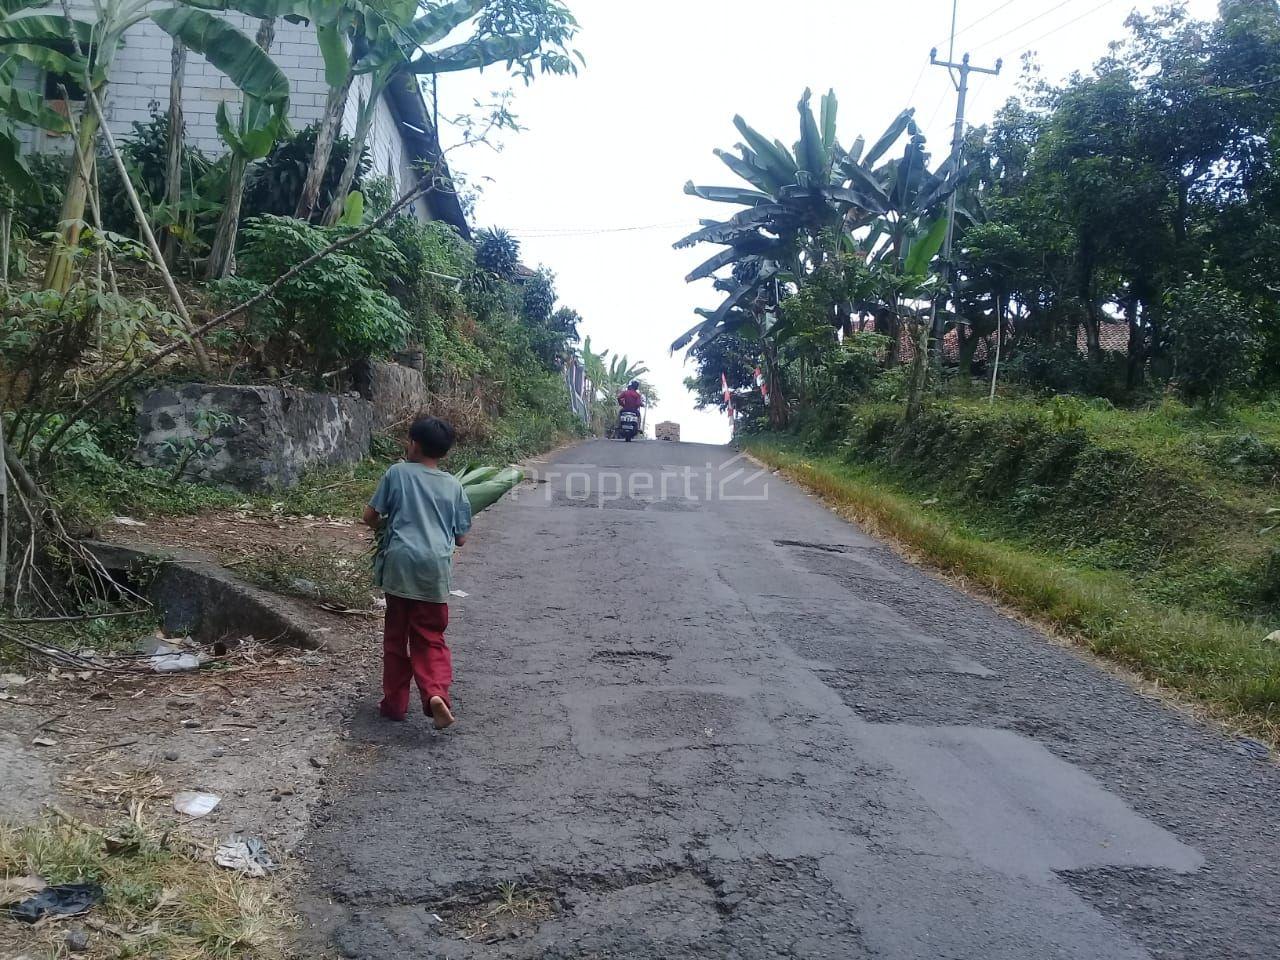 Land 5.5 Ha Allocation of Housing in Sukajadi, Bogor, Tamansari